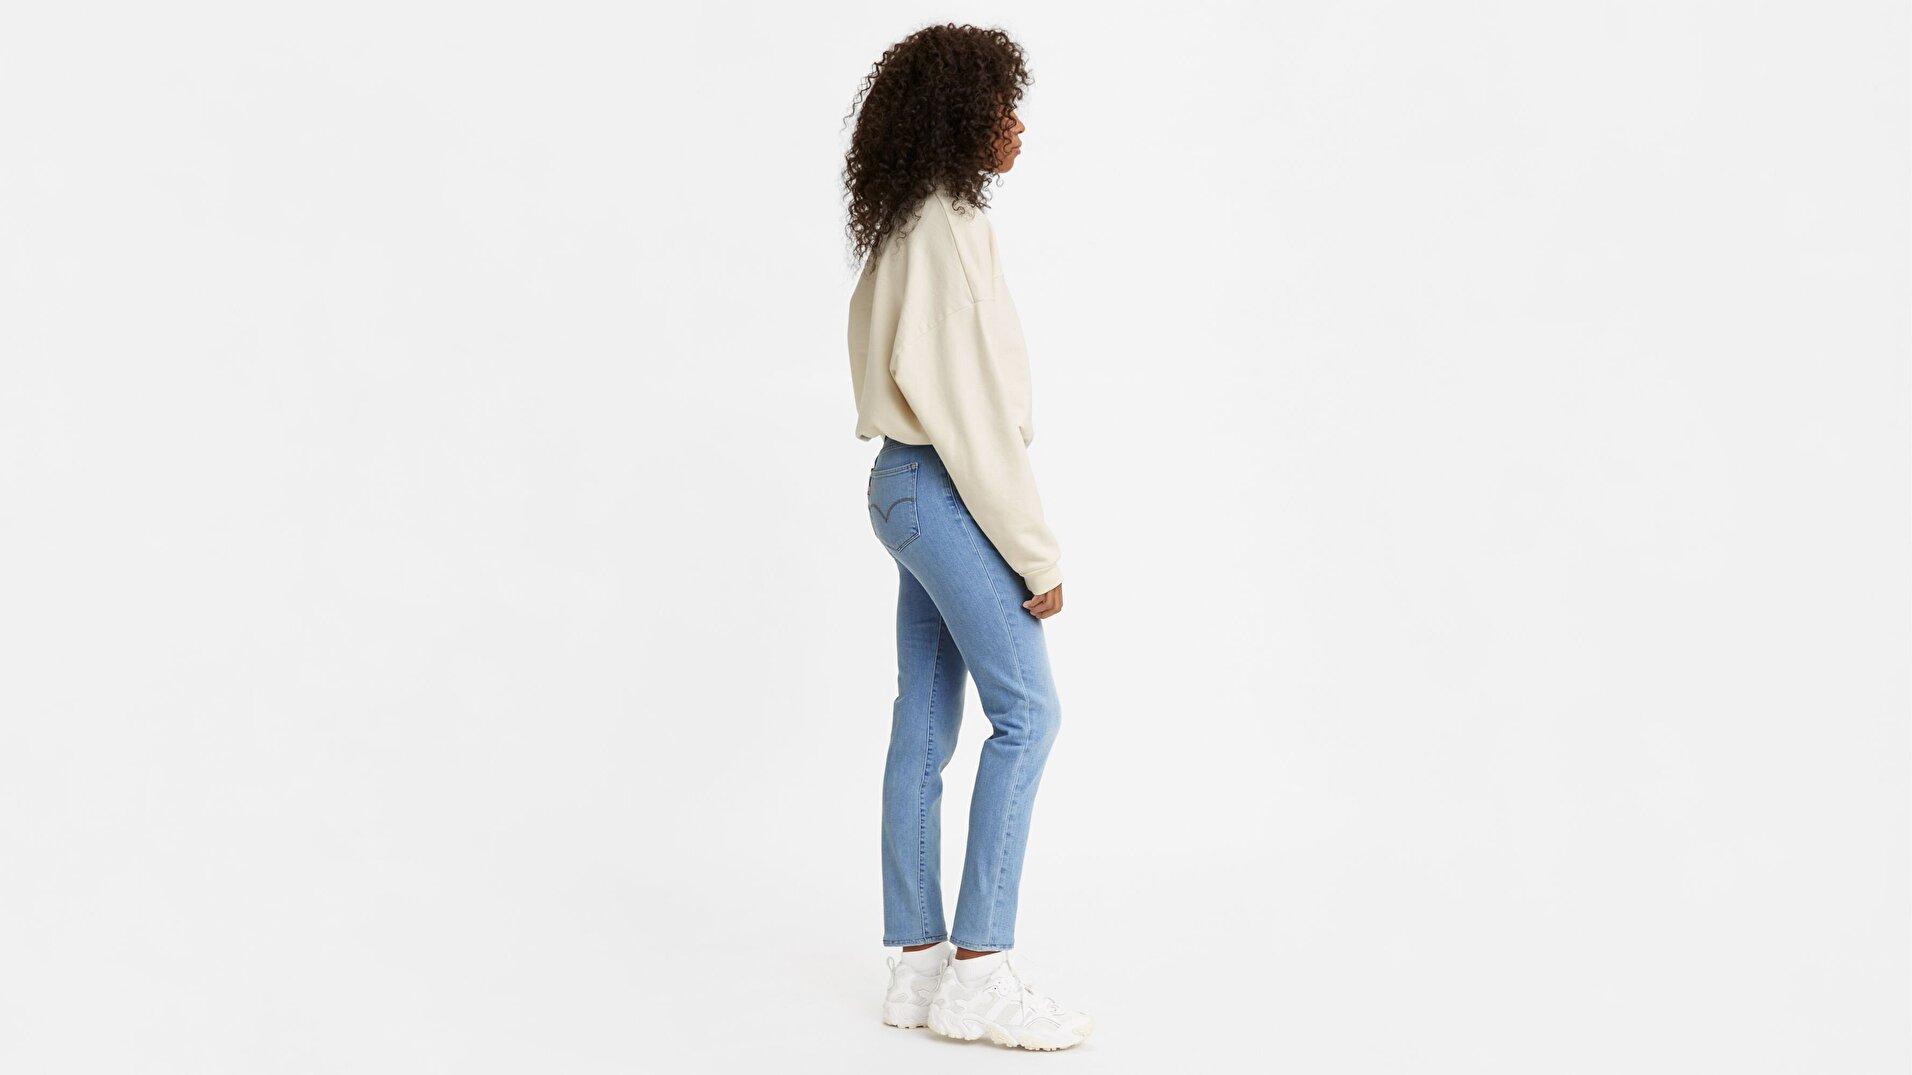 721™ High Rise Skinny Kadın Jean Pantolon - Don't Be Extra - Dark Indigo